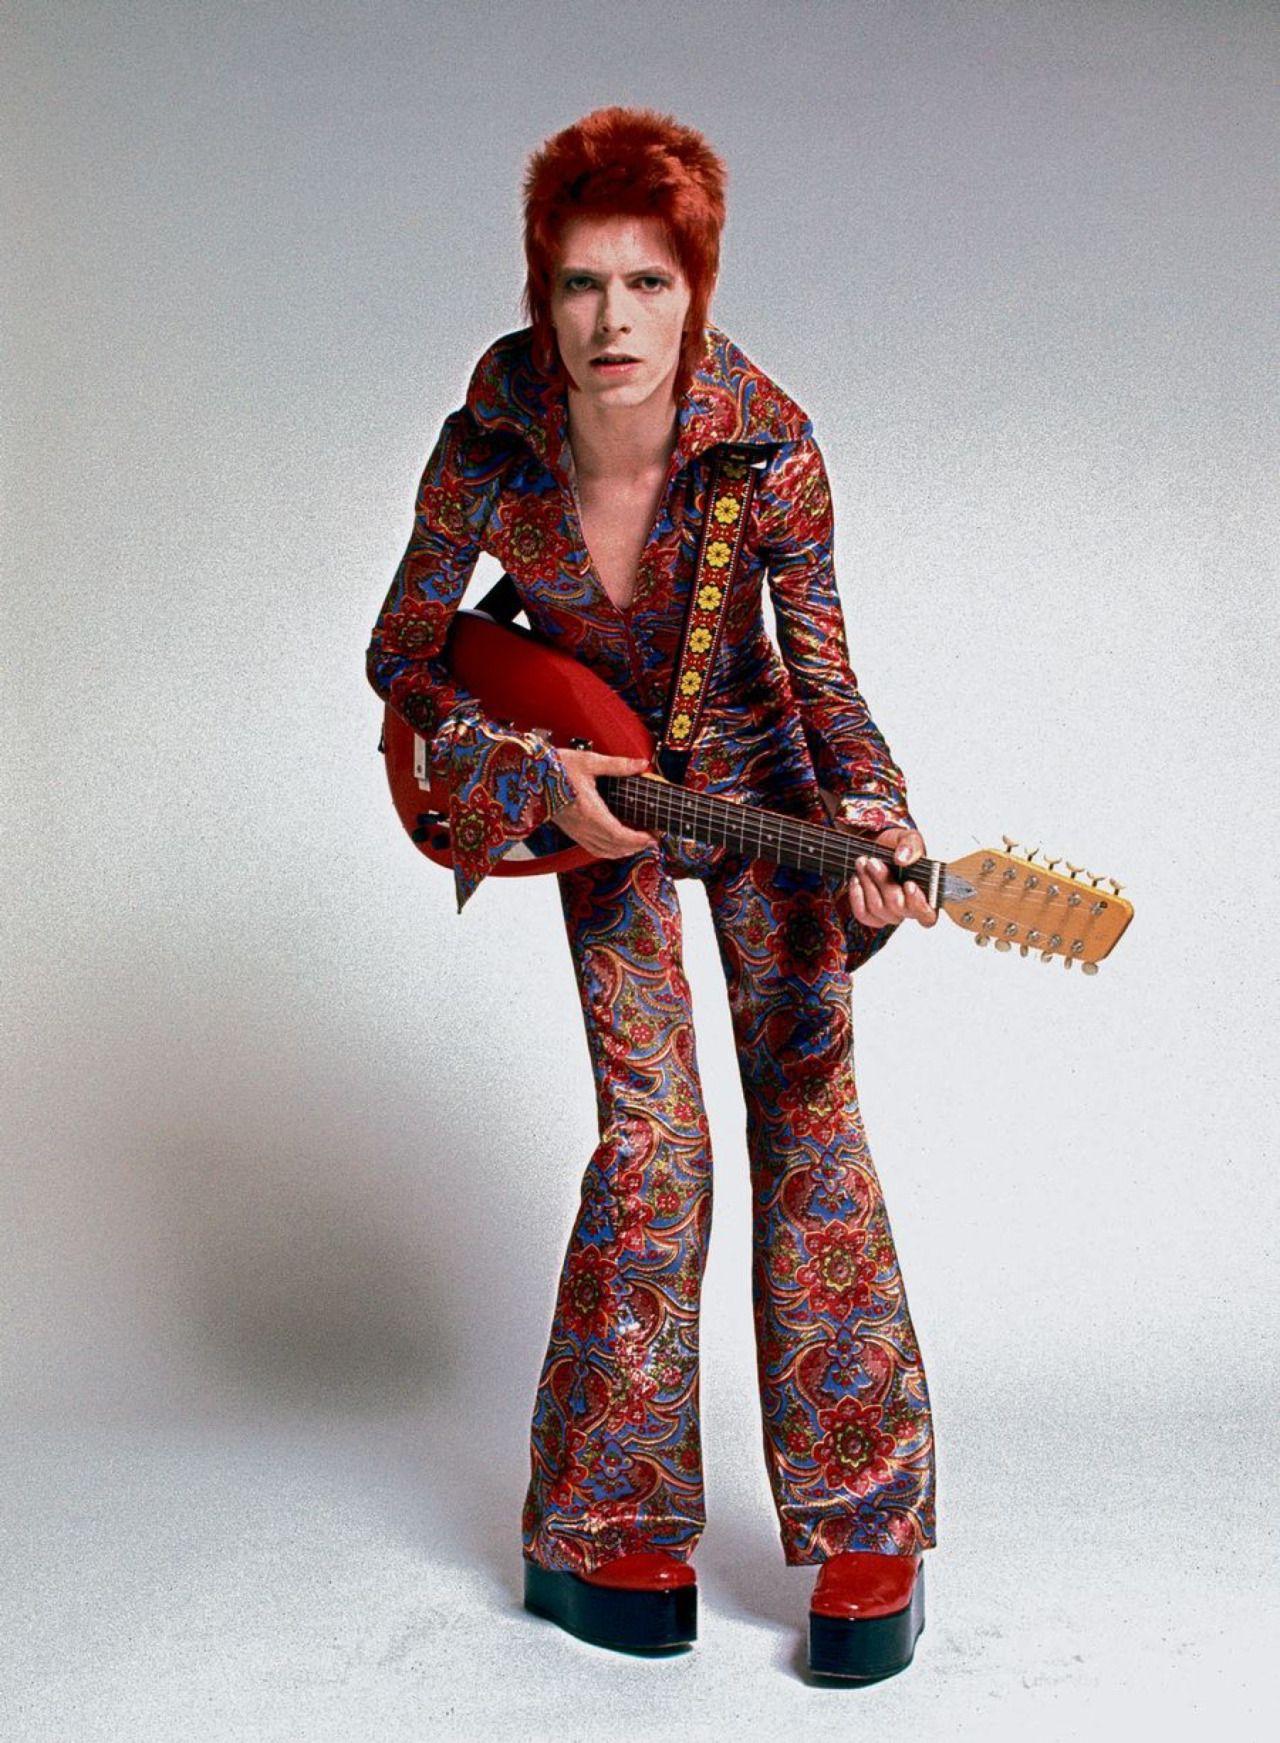 David Bowie (1947 - 2016)